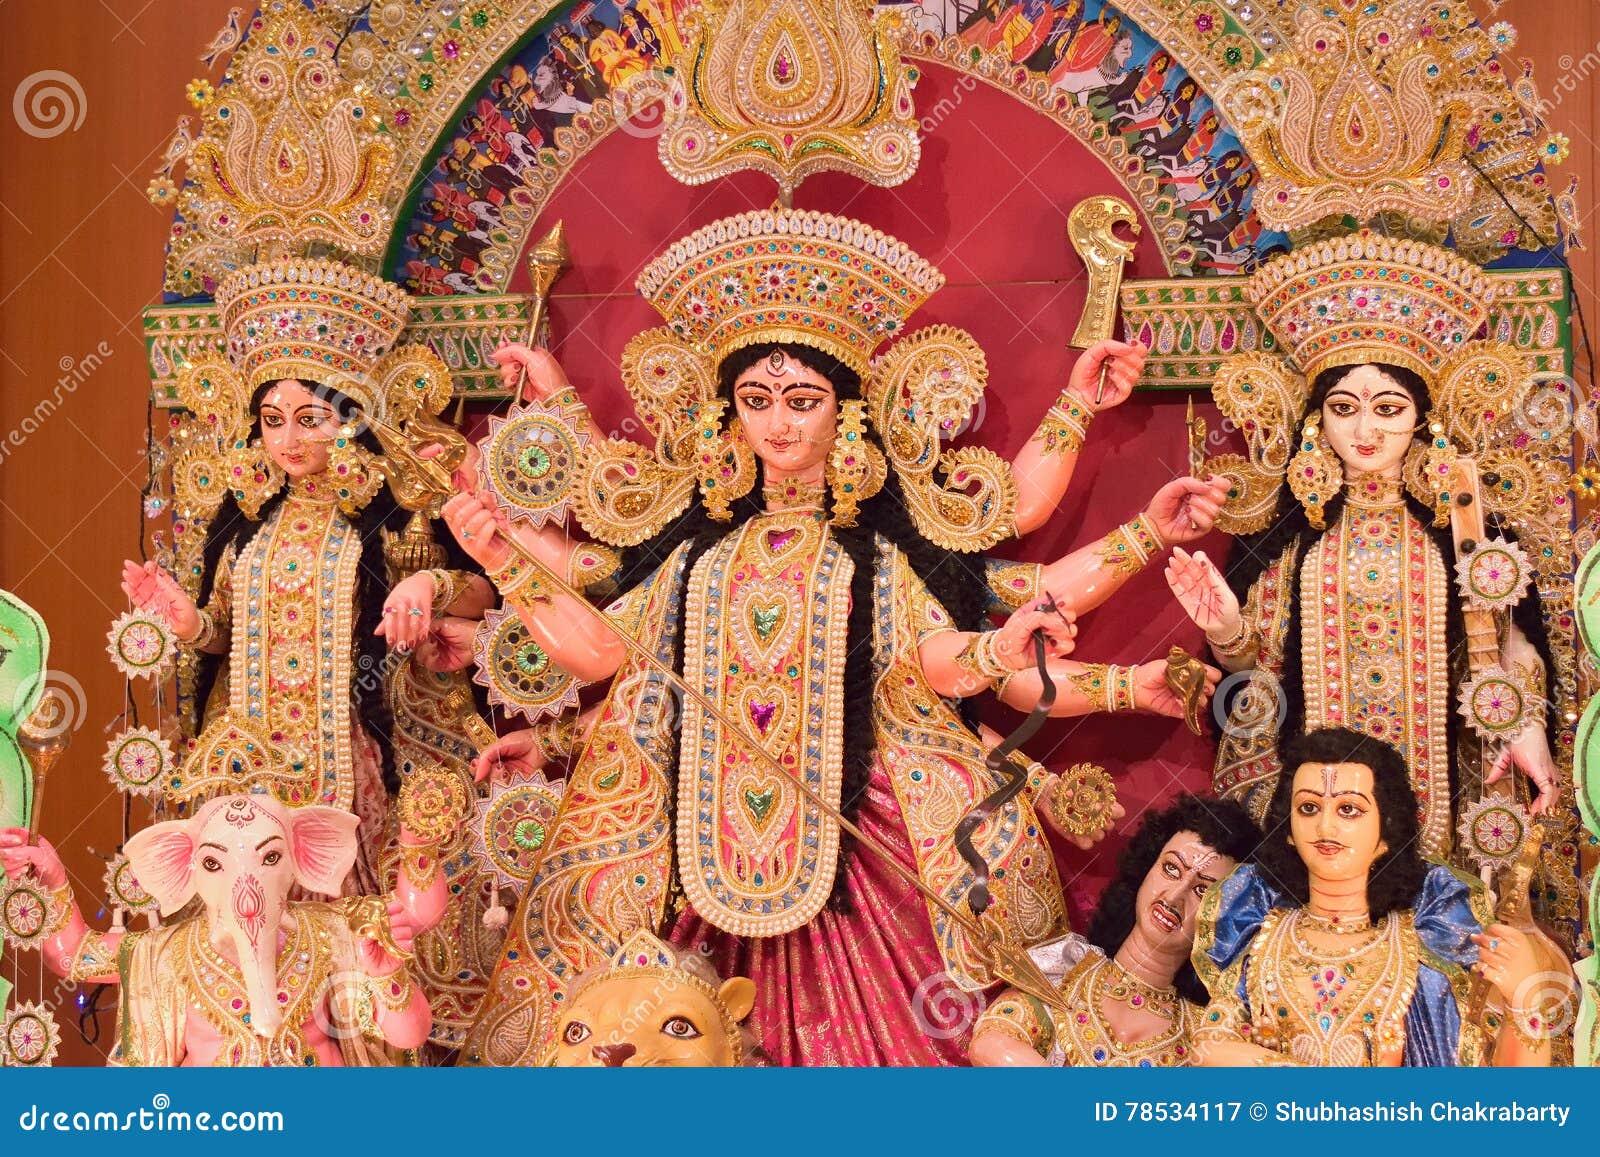 11 098 Durga Photos Free Royalty Free Stock Photos From Dreamstime